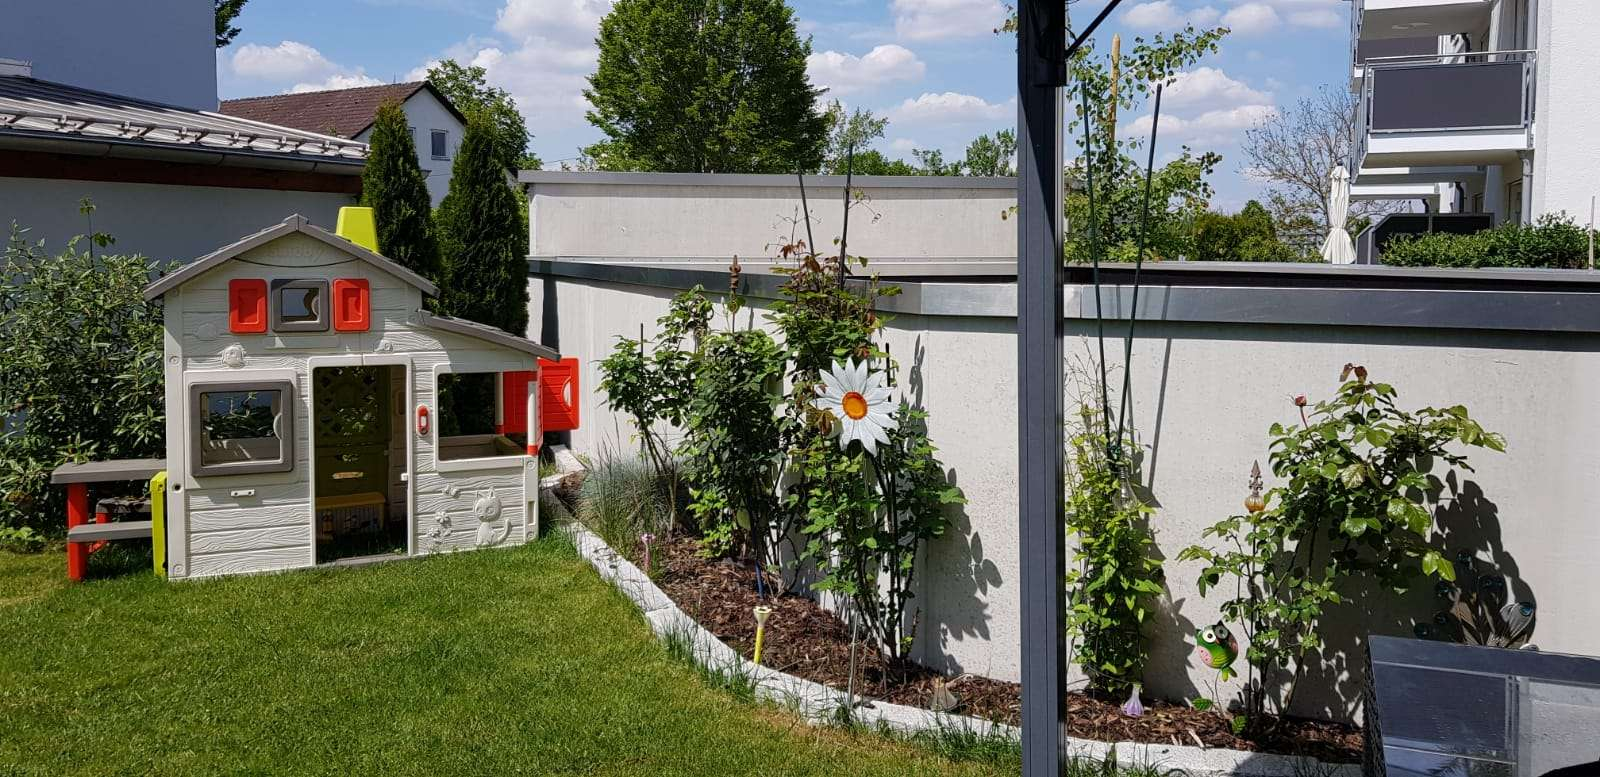 **extra-immobilien** Neubau - Gehobene 2 Zimmer Erdgeschoßwohnung in Moosburg